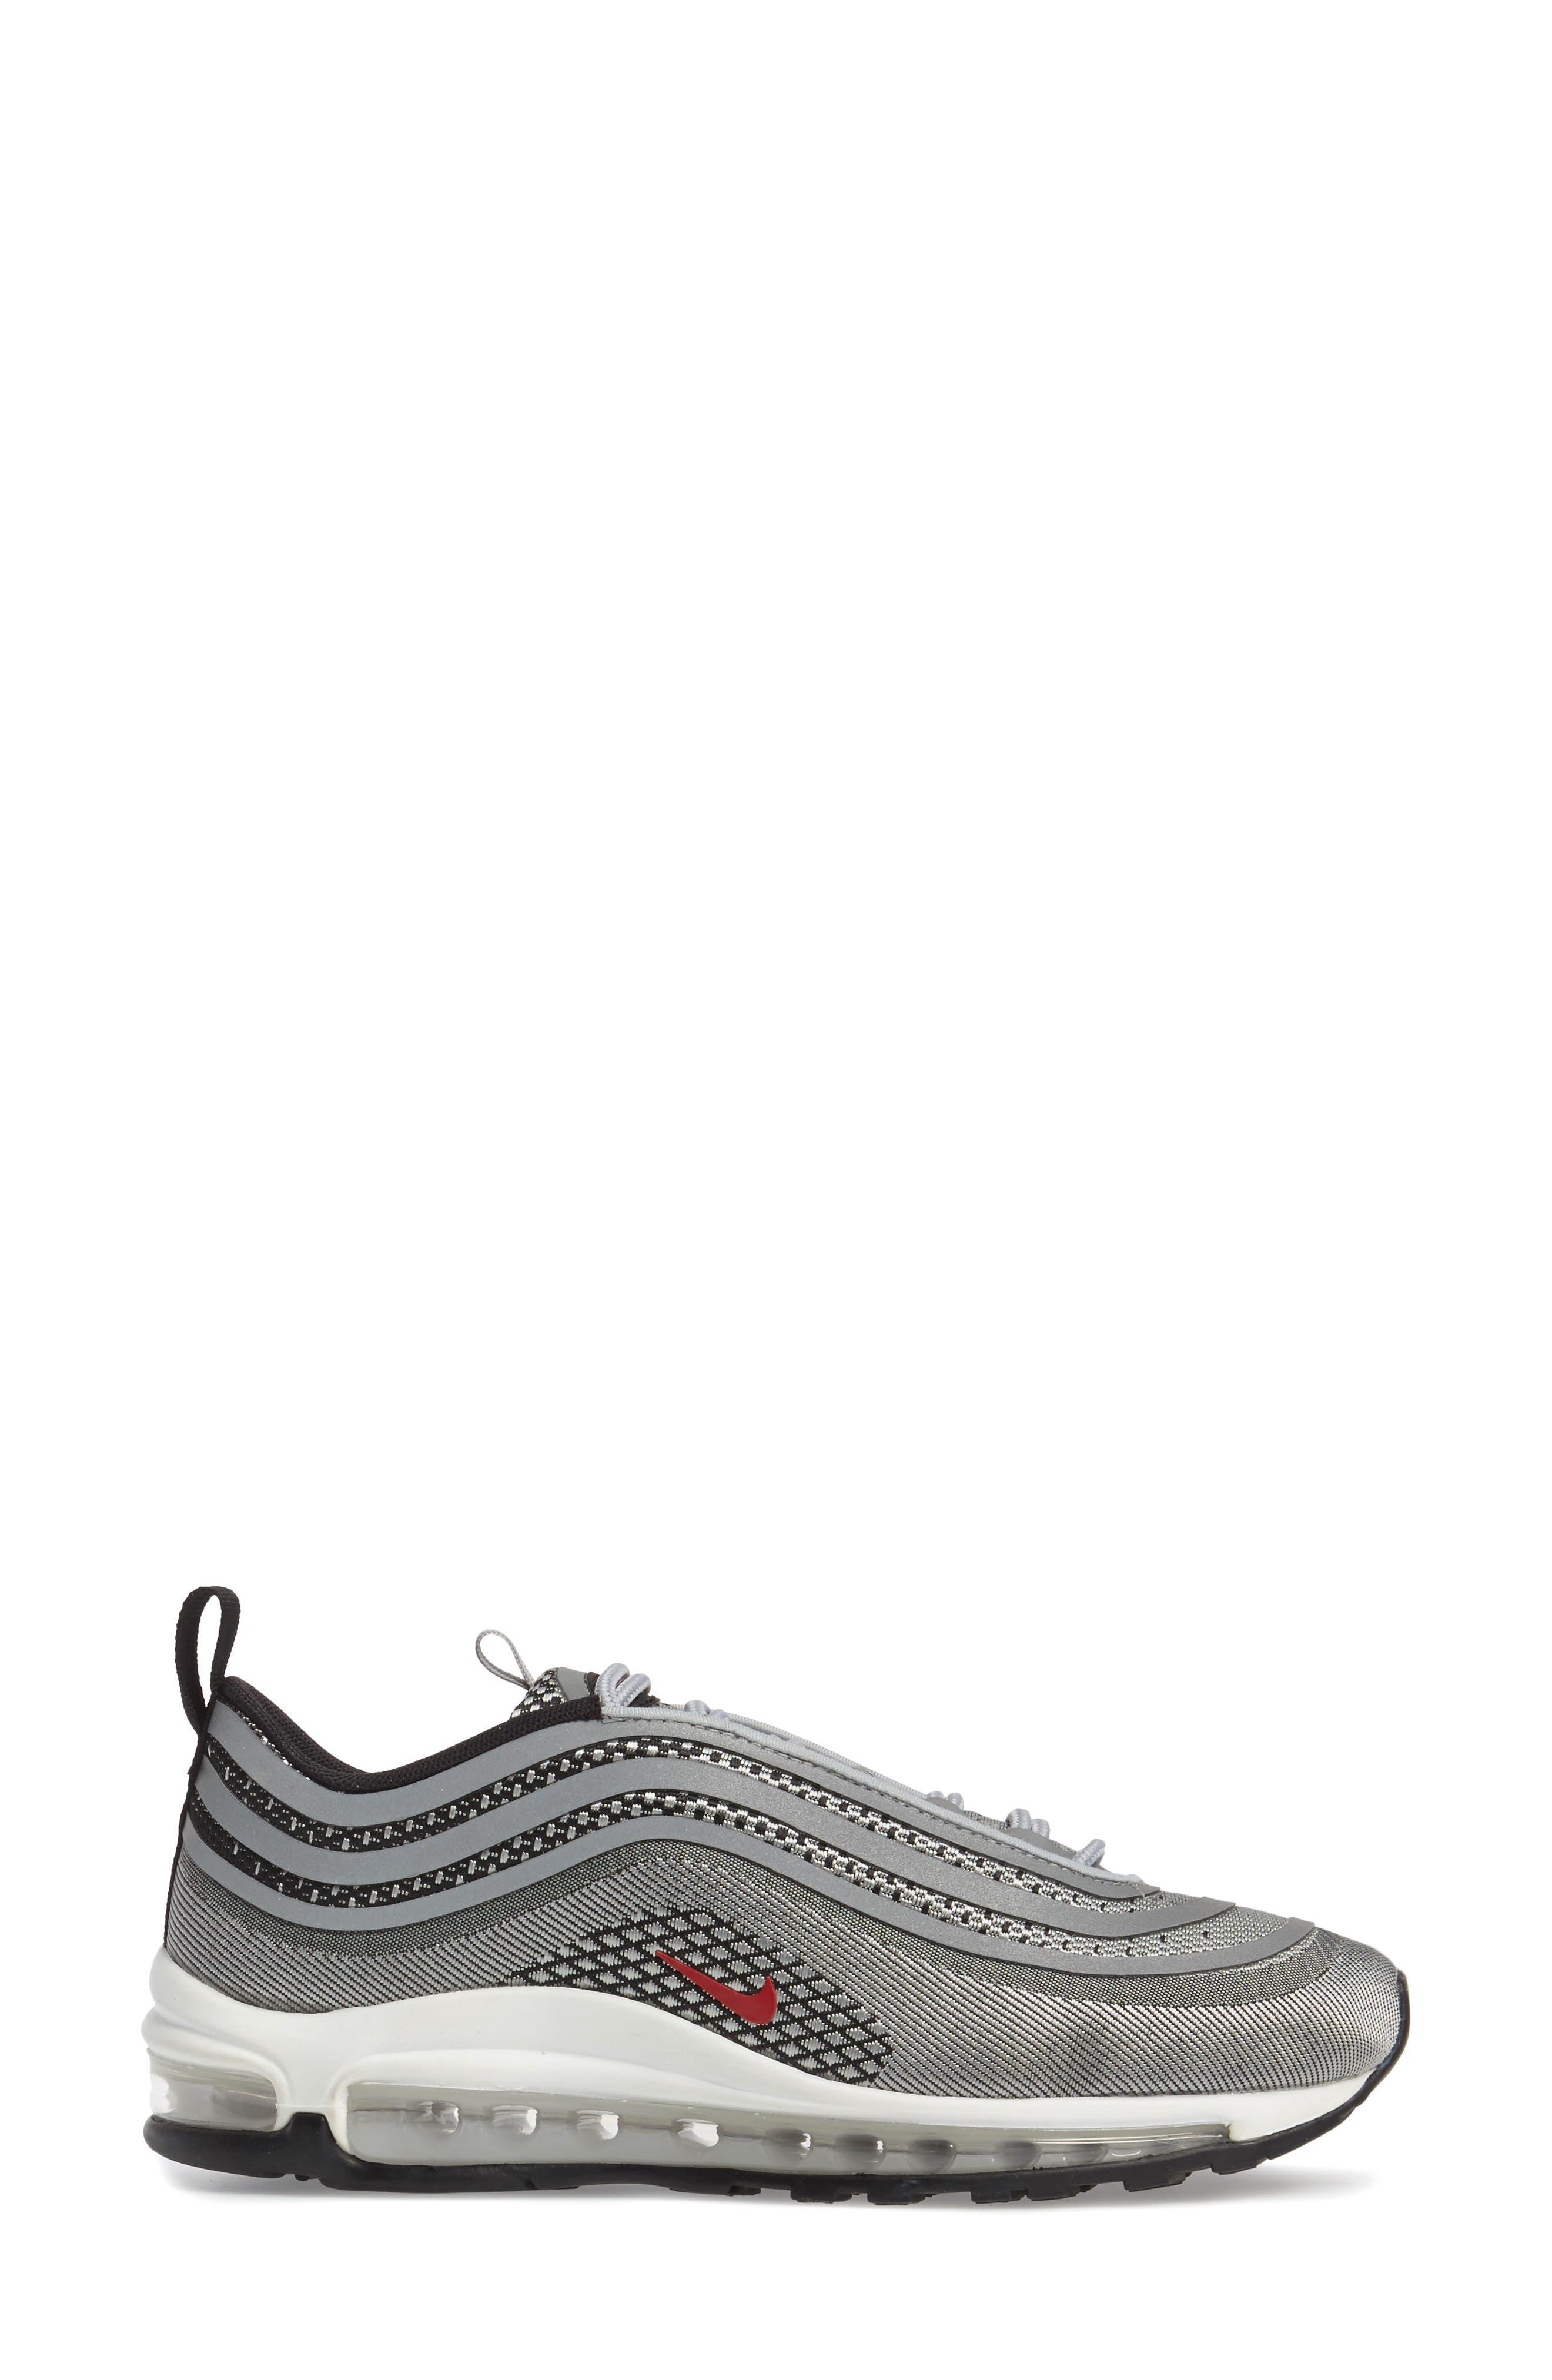 Air Max 97 Ultralight 2017 Sneaker,                             Alternate thumbnail 3, color,                             Metallic Silver/ Varsity Red